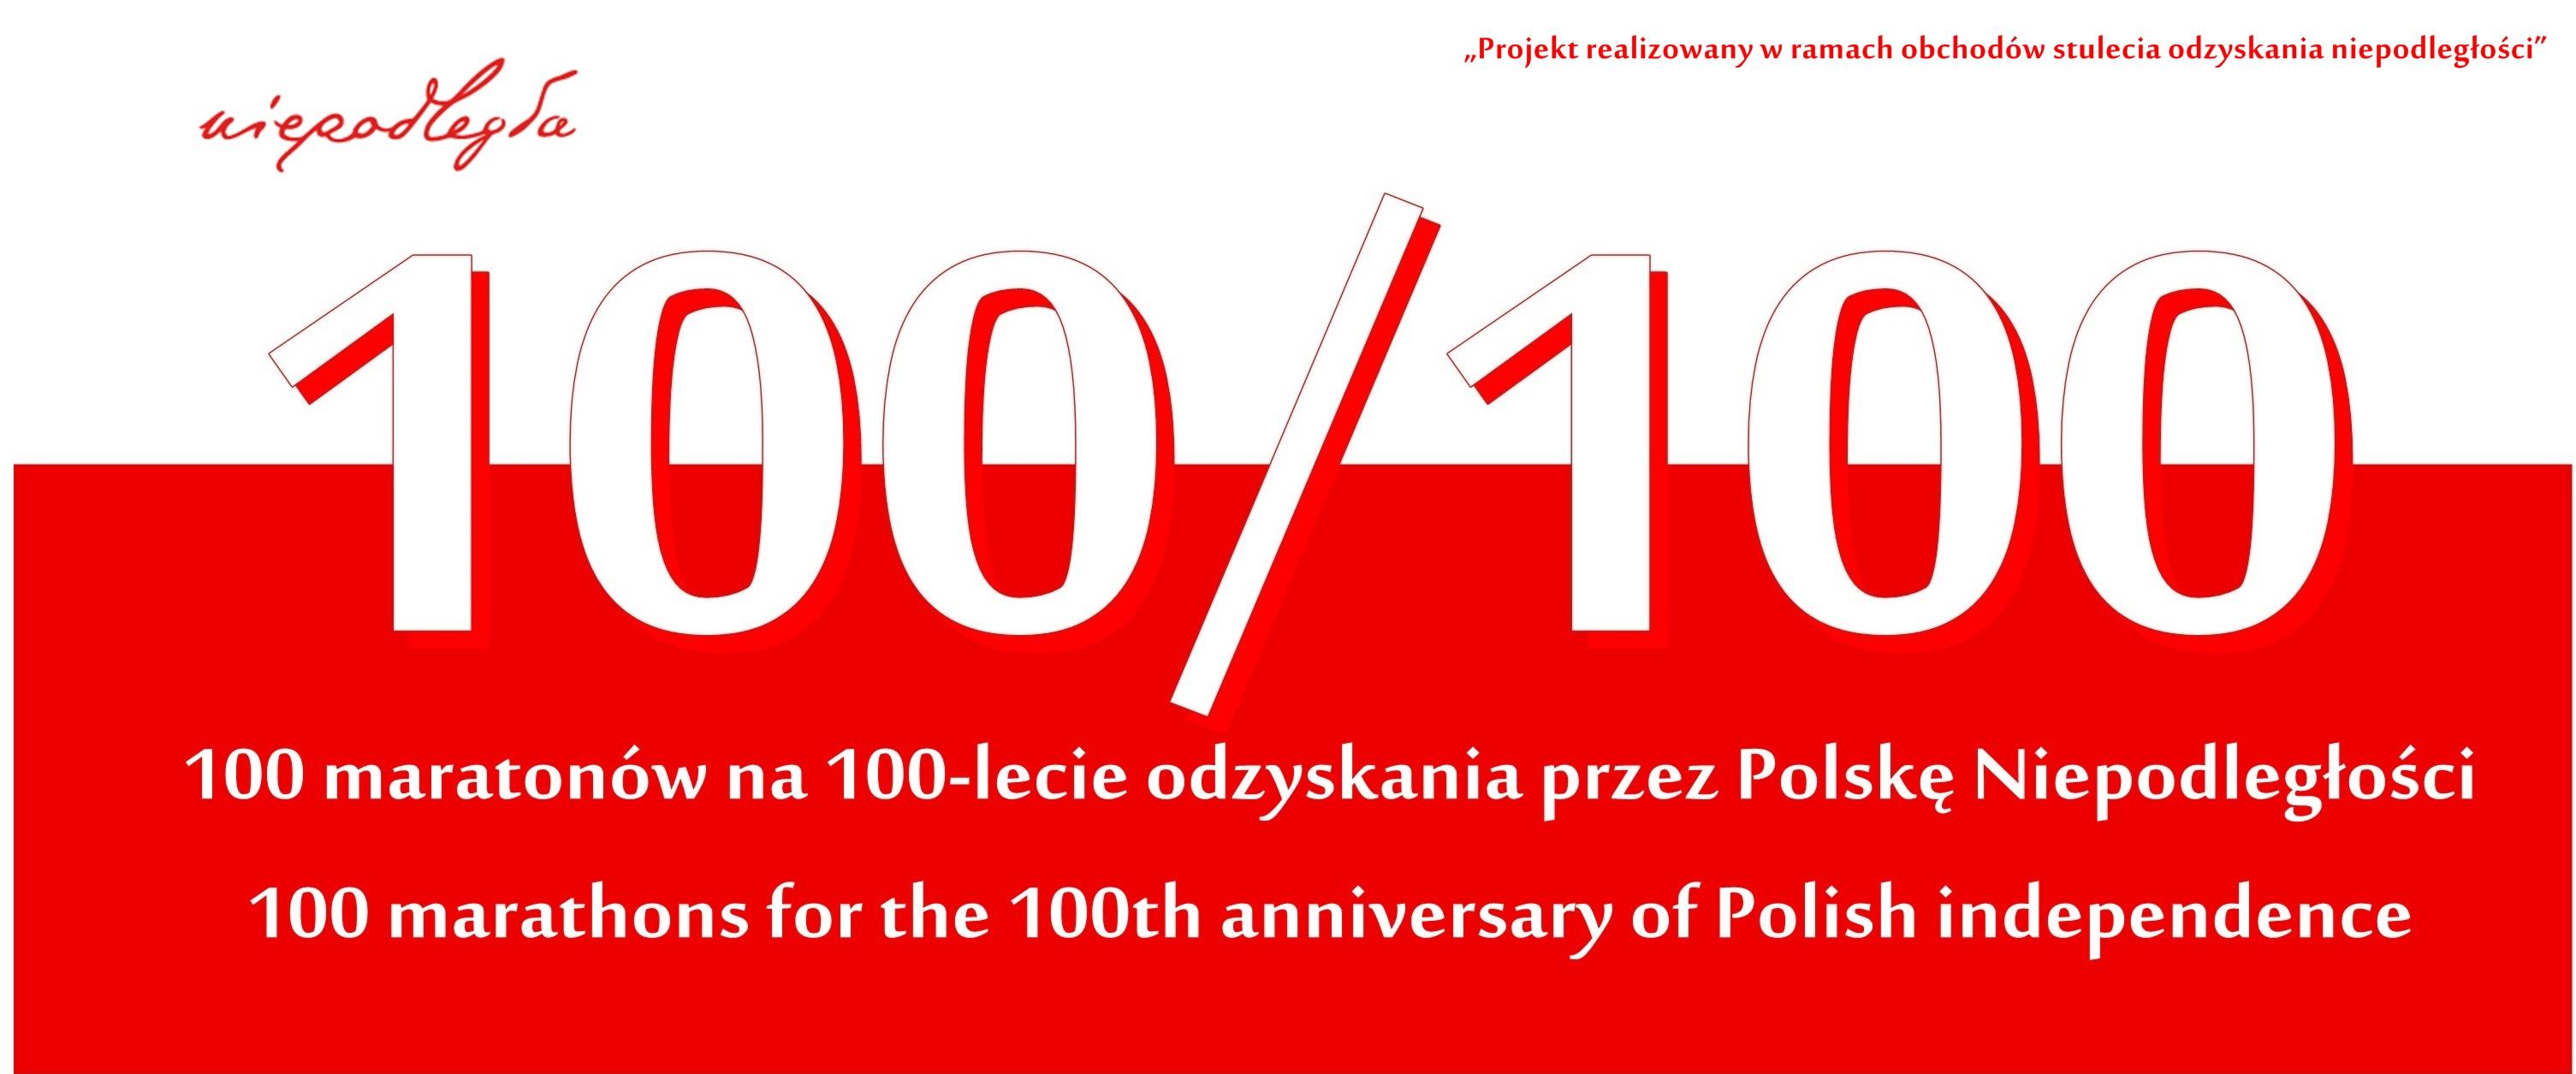 Logo 100/100